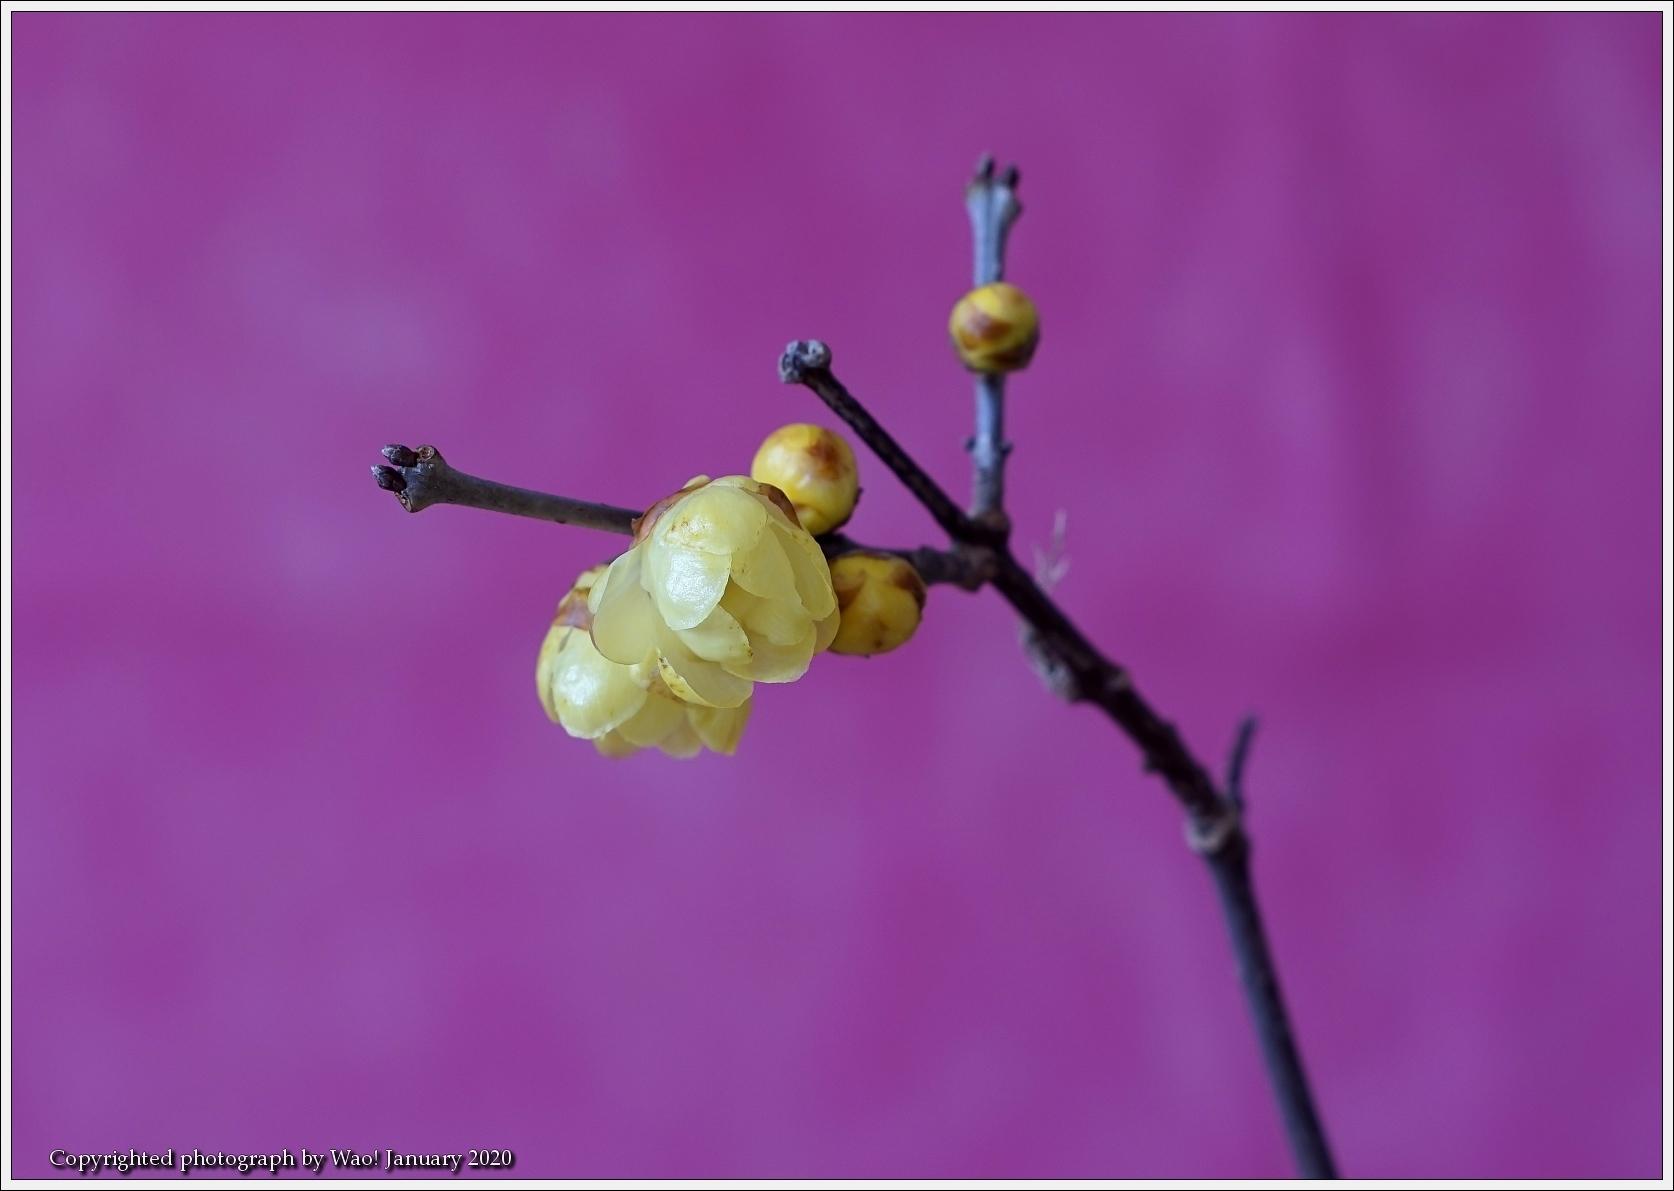 蝋梅 早春の花_c0198669_17560074.jpg